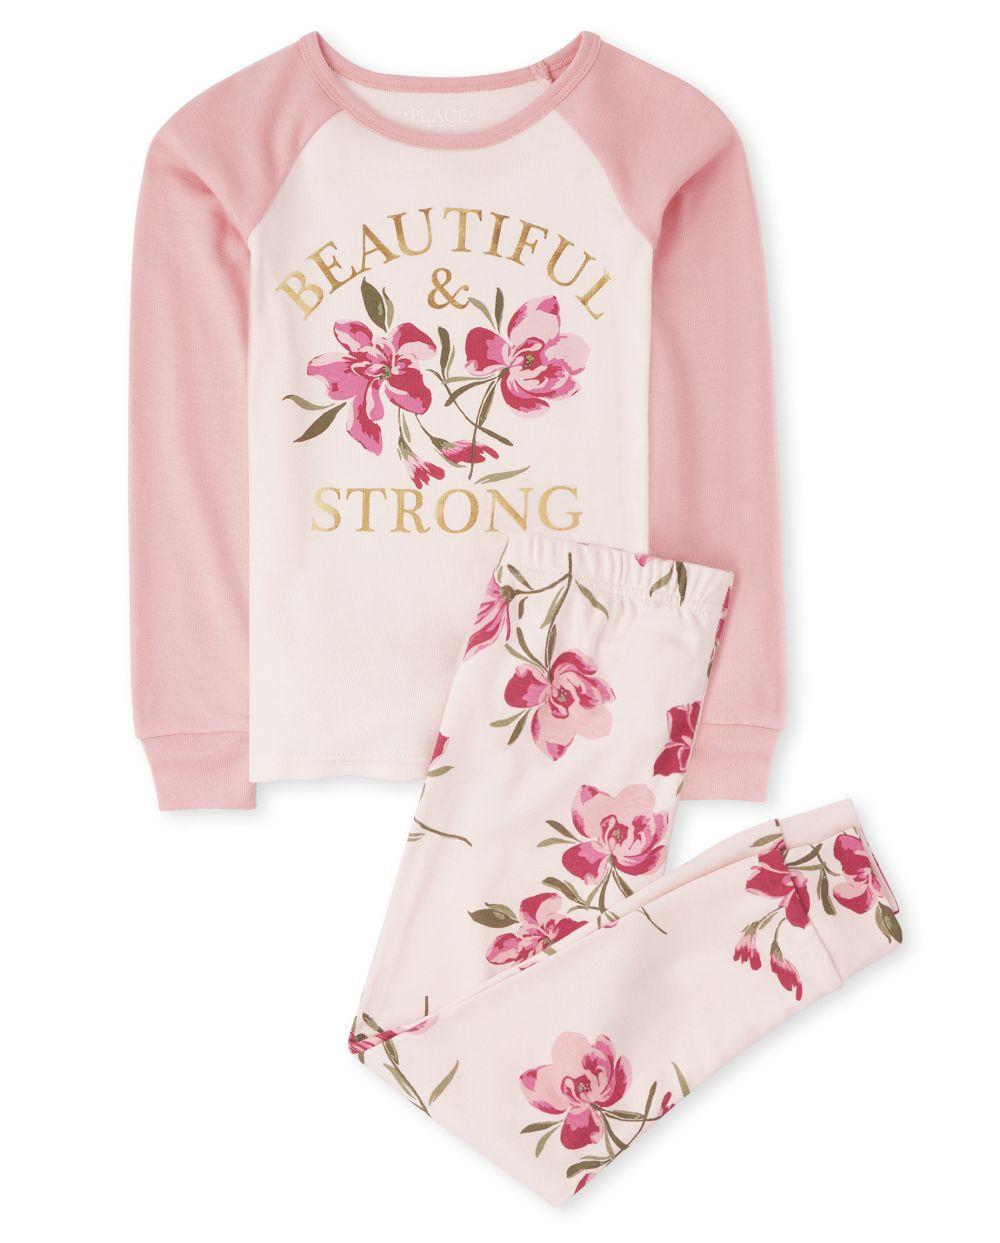 Girls Beautiful Floral Snug Fit Cotton Pajamas